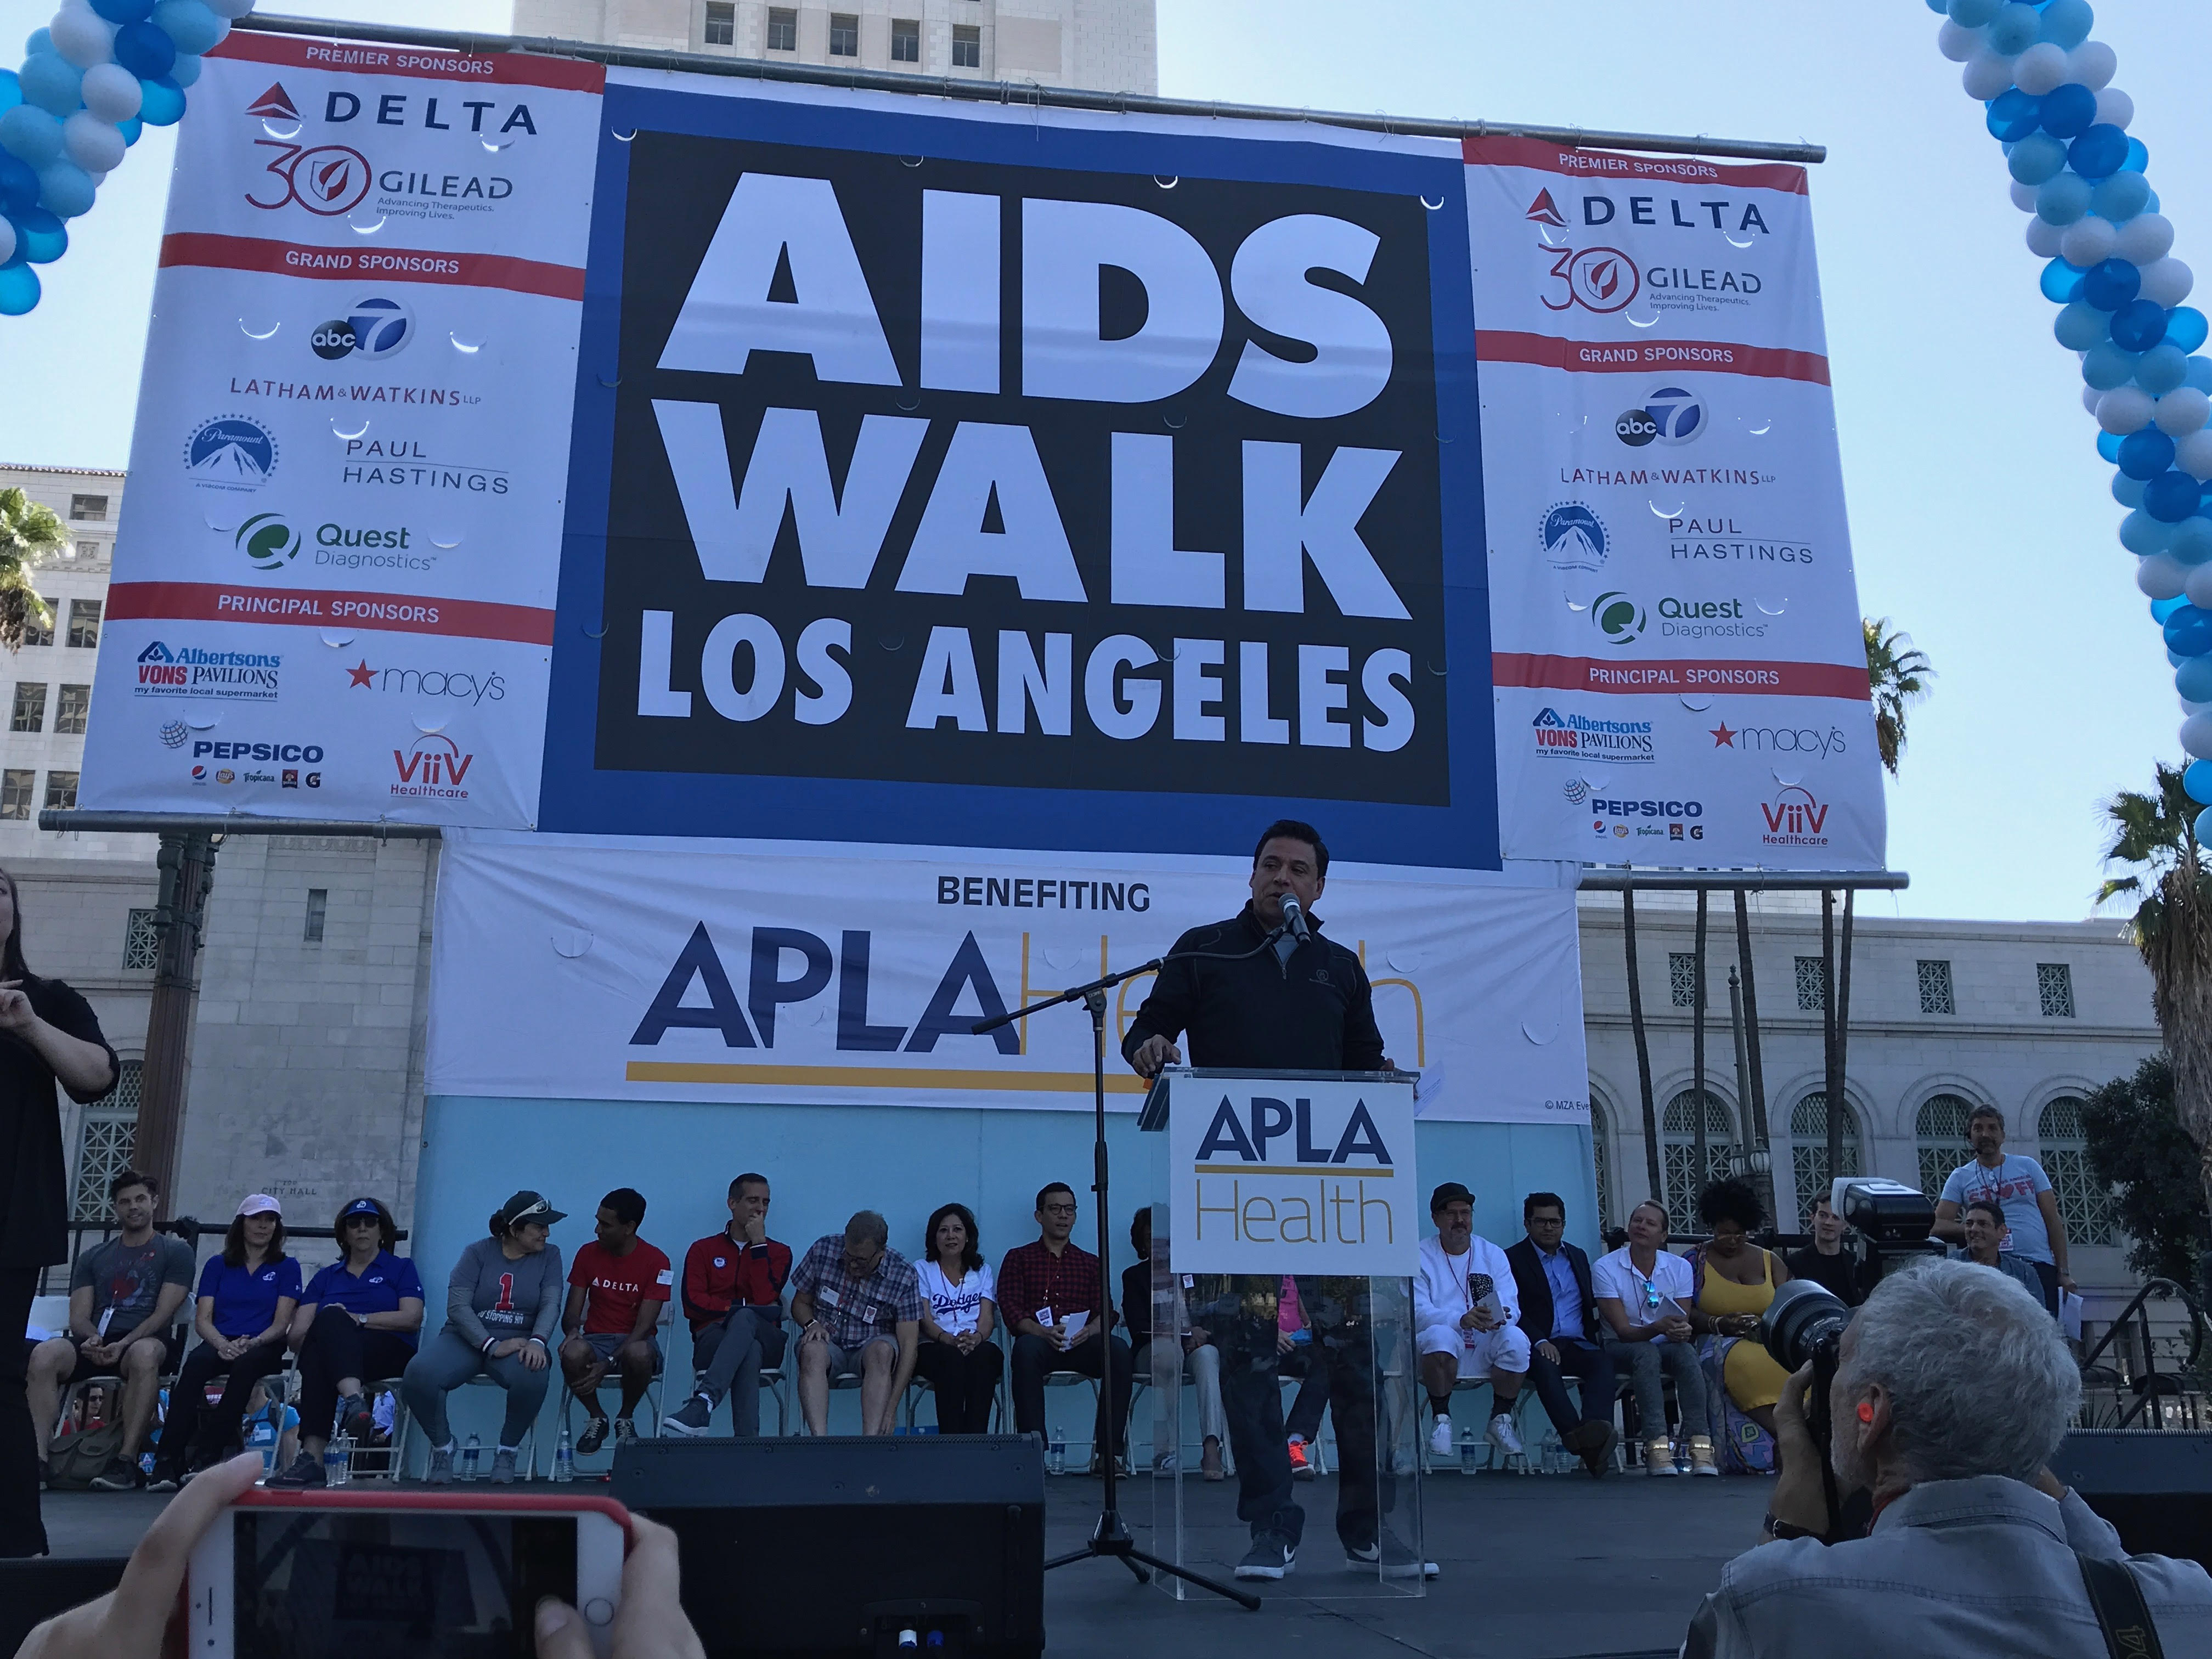 Aids_Walk.jpg